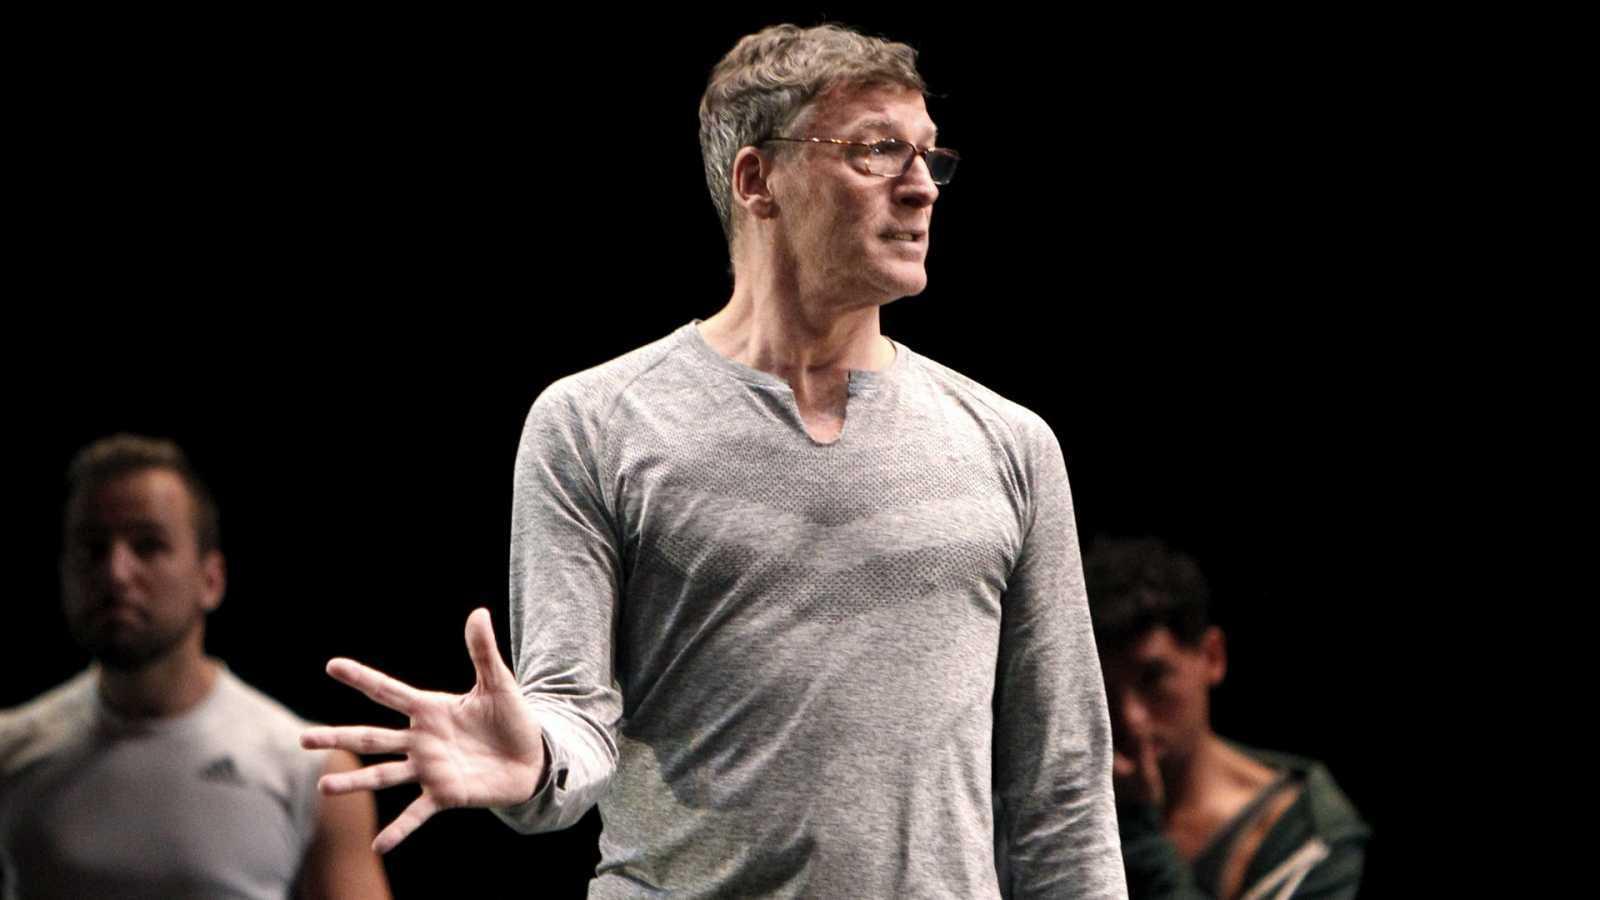 El bailarín y coreógrafo Nacho Duato, Premio Max de Honor